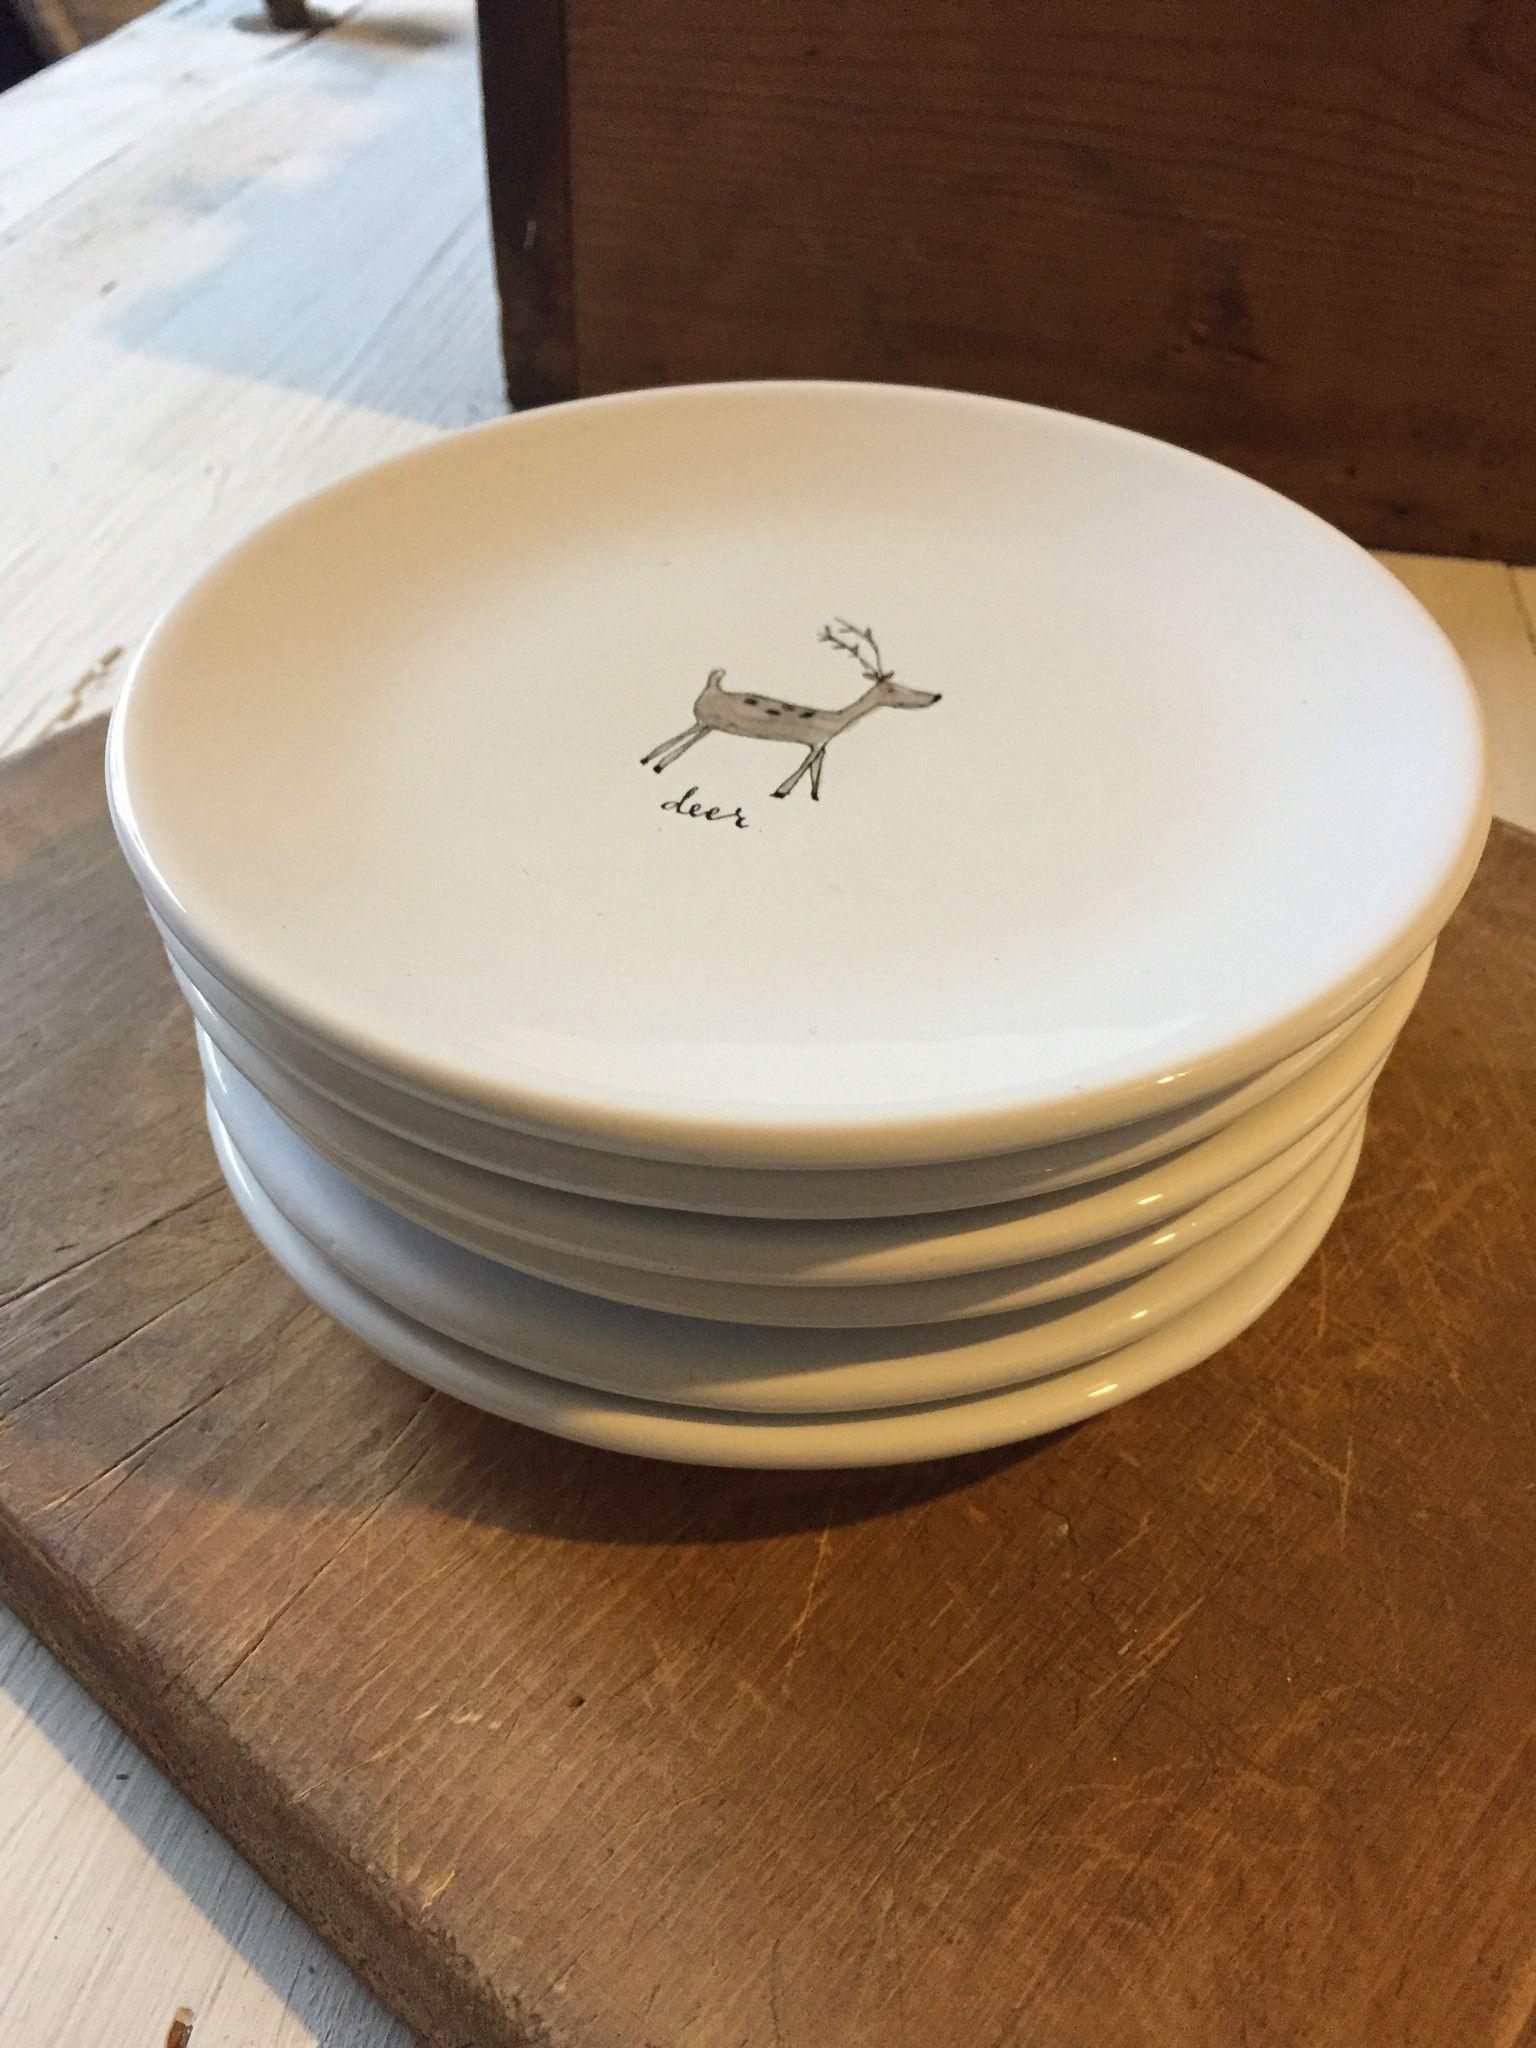 Rae Dunn Christmas Plates Rae Dunn in 2018 Pinterest